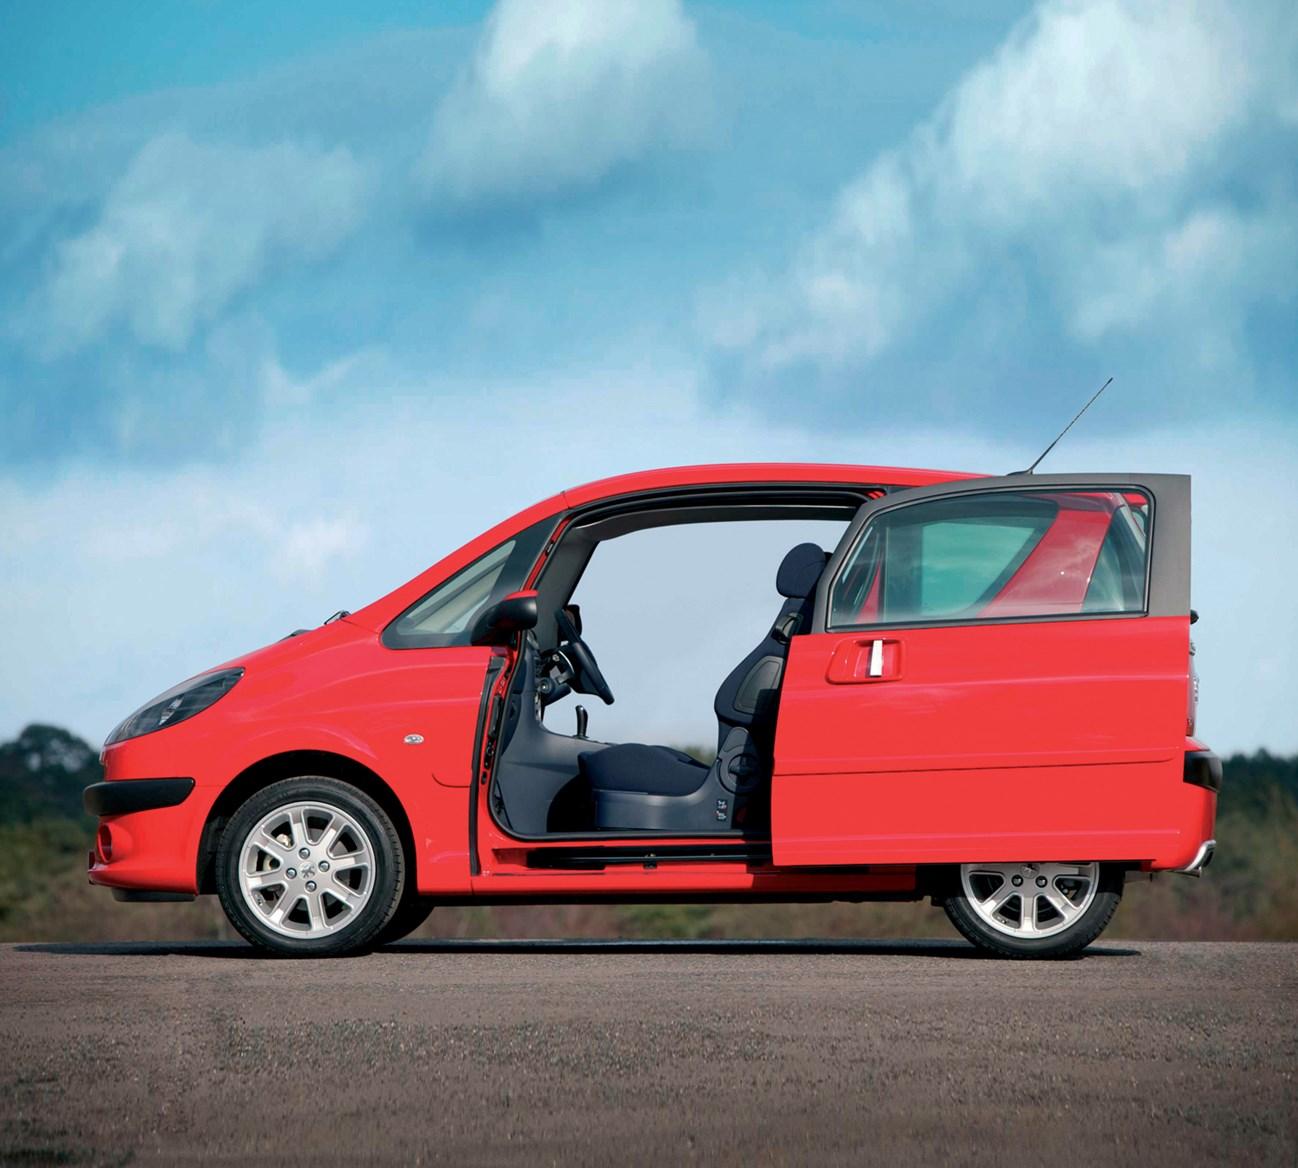 Peugeot 1007 Hatchback (2005 - 2009) Photos